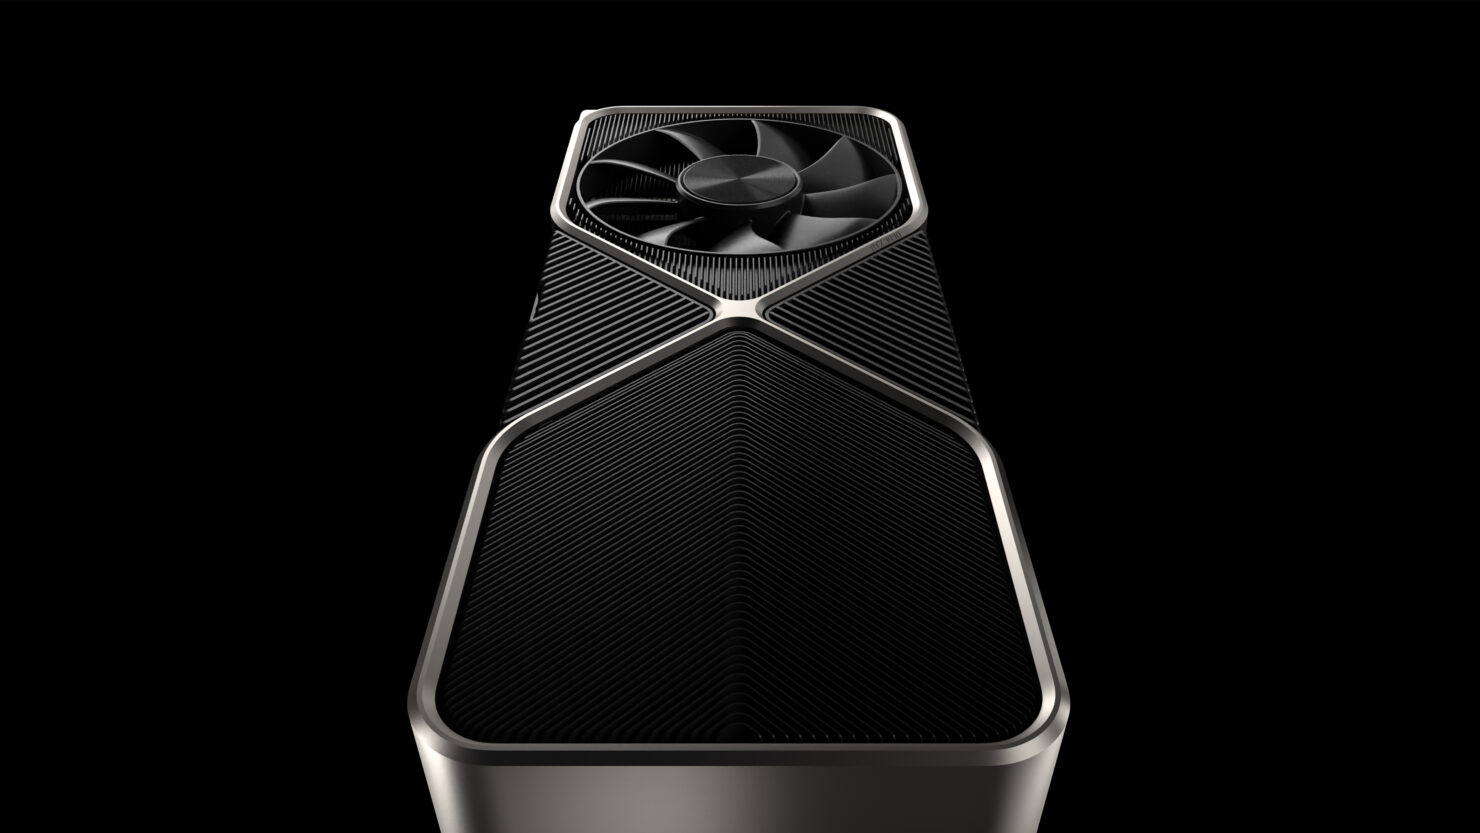 nvidia-geforce-rtx-3080-ti-graphics-card's-ga102-225-gpu-pictured,-specs-leak-out-&-price-rumored-around-$1000-us